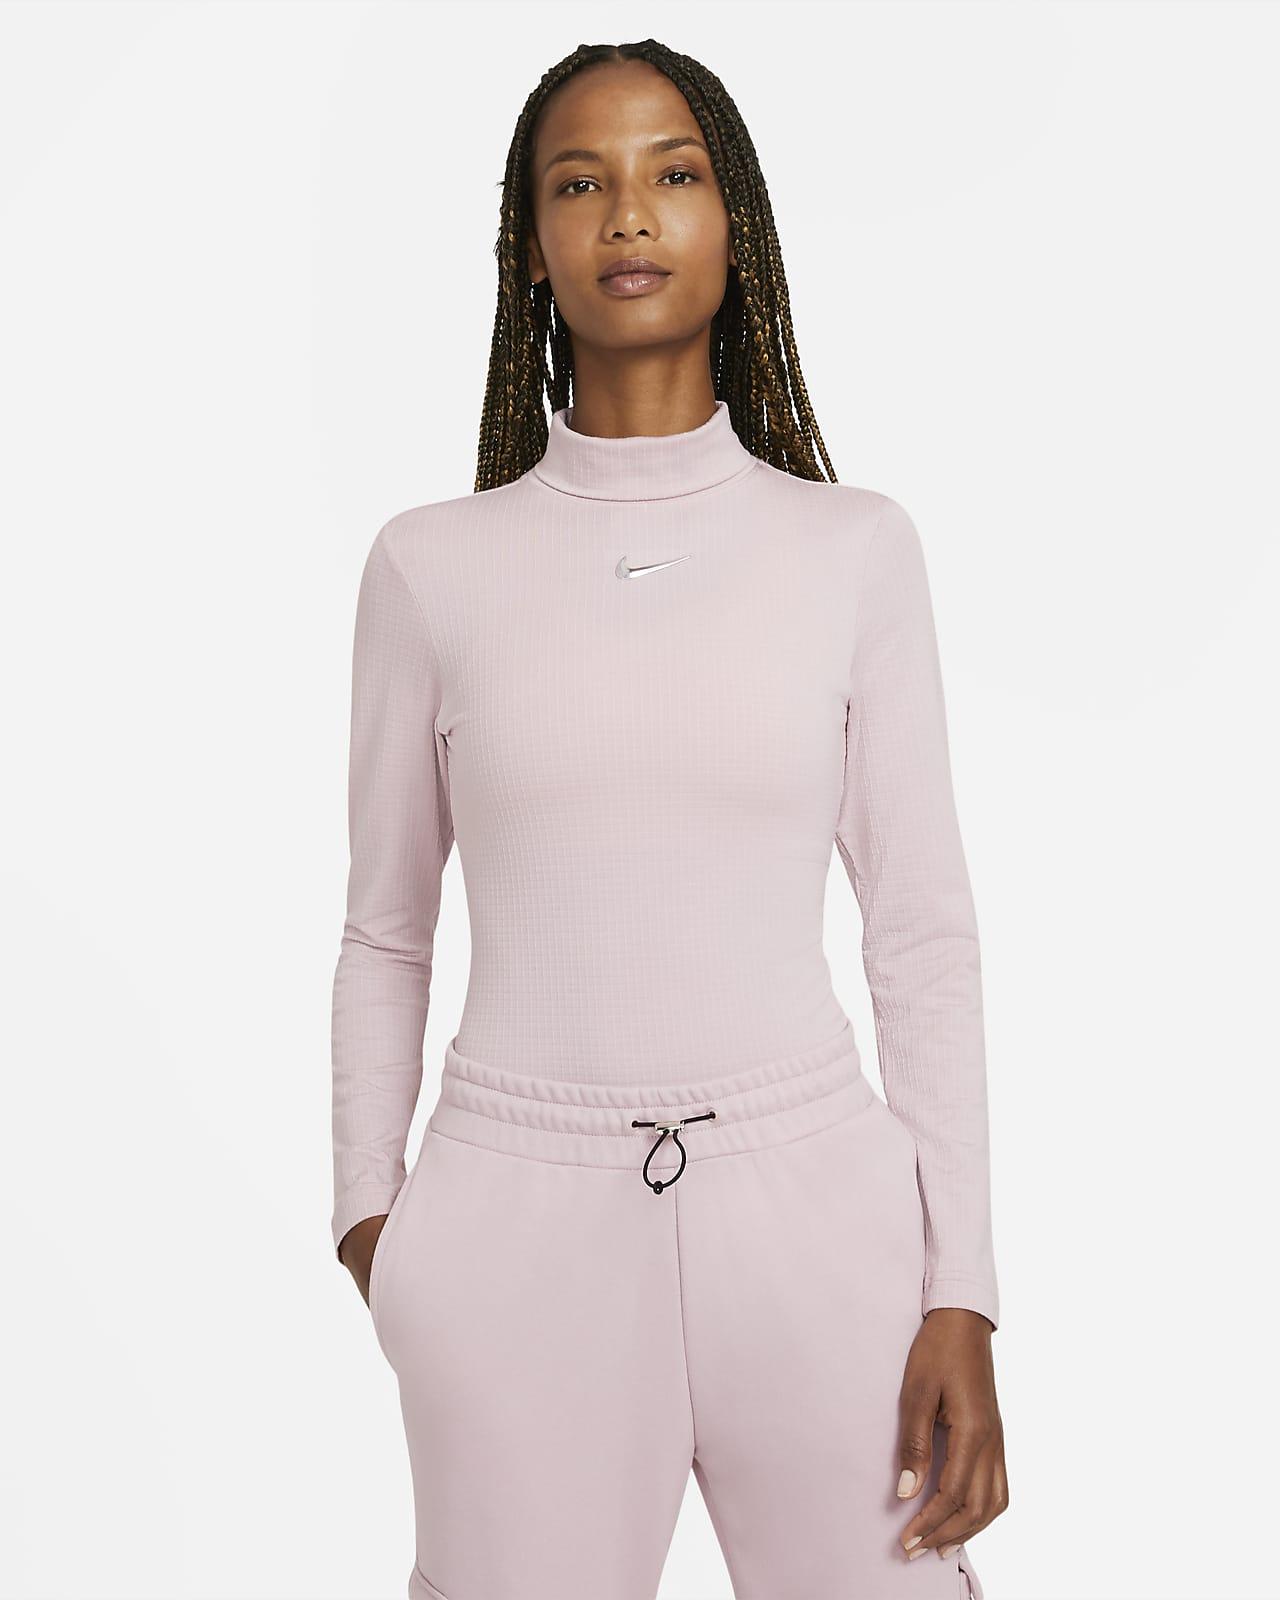 Nike Sportswear Swoosh Langarm-Oberteil für Damen